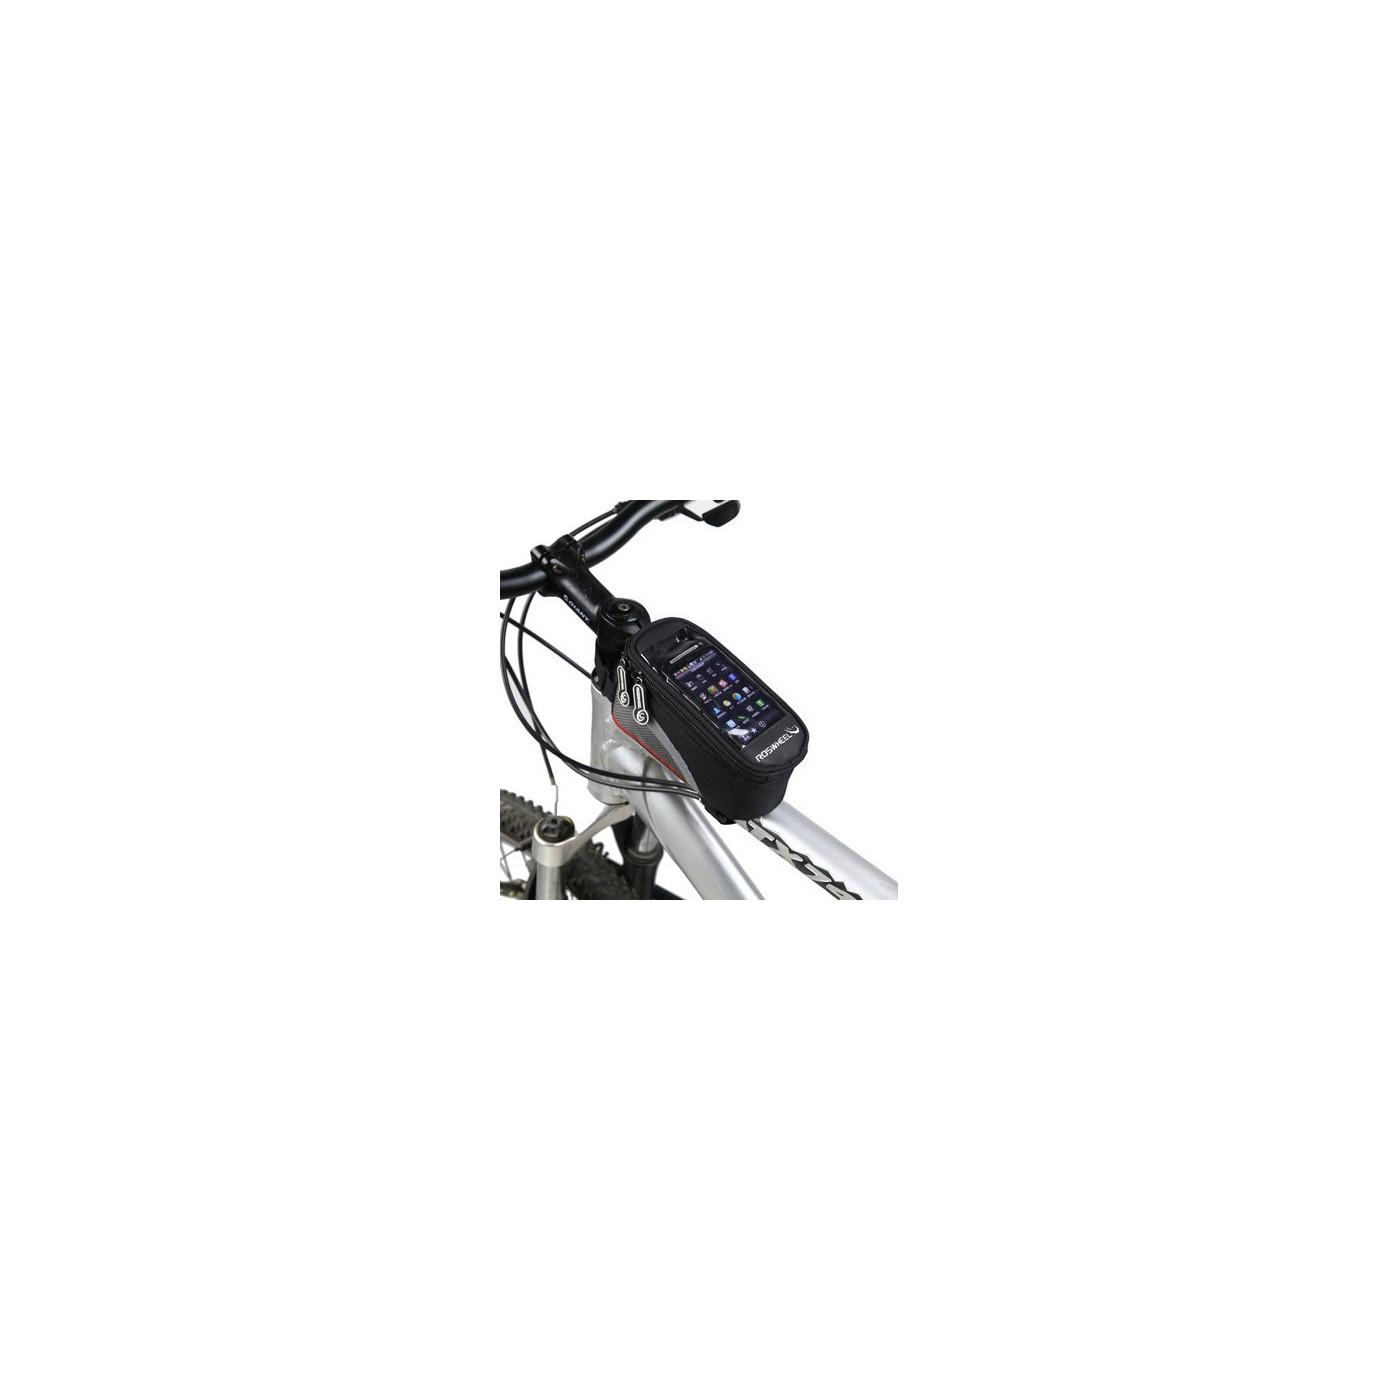 Porta smartphone iphone per bici borsa marsupio porta - Porta bici smart ...